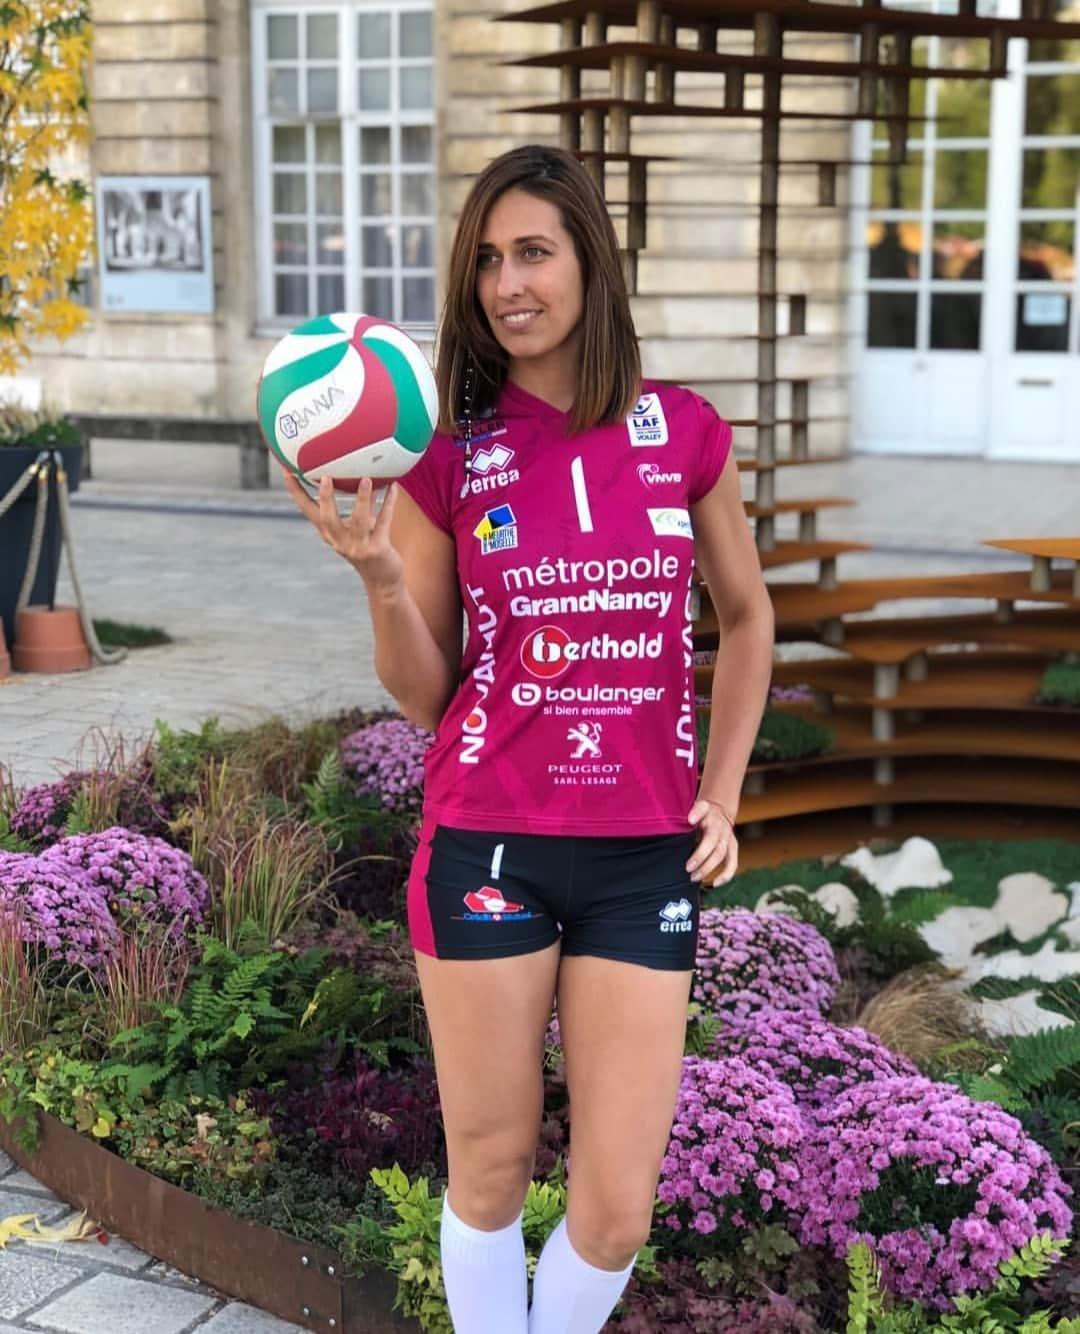 nouveau-maillot-volley-vandoeuvre-nancy-volley-ball-errea-2018-2019-laf-lnv-6